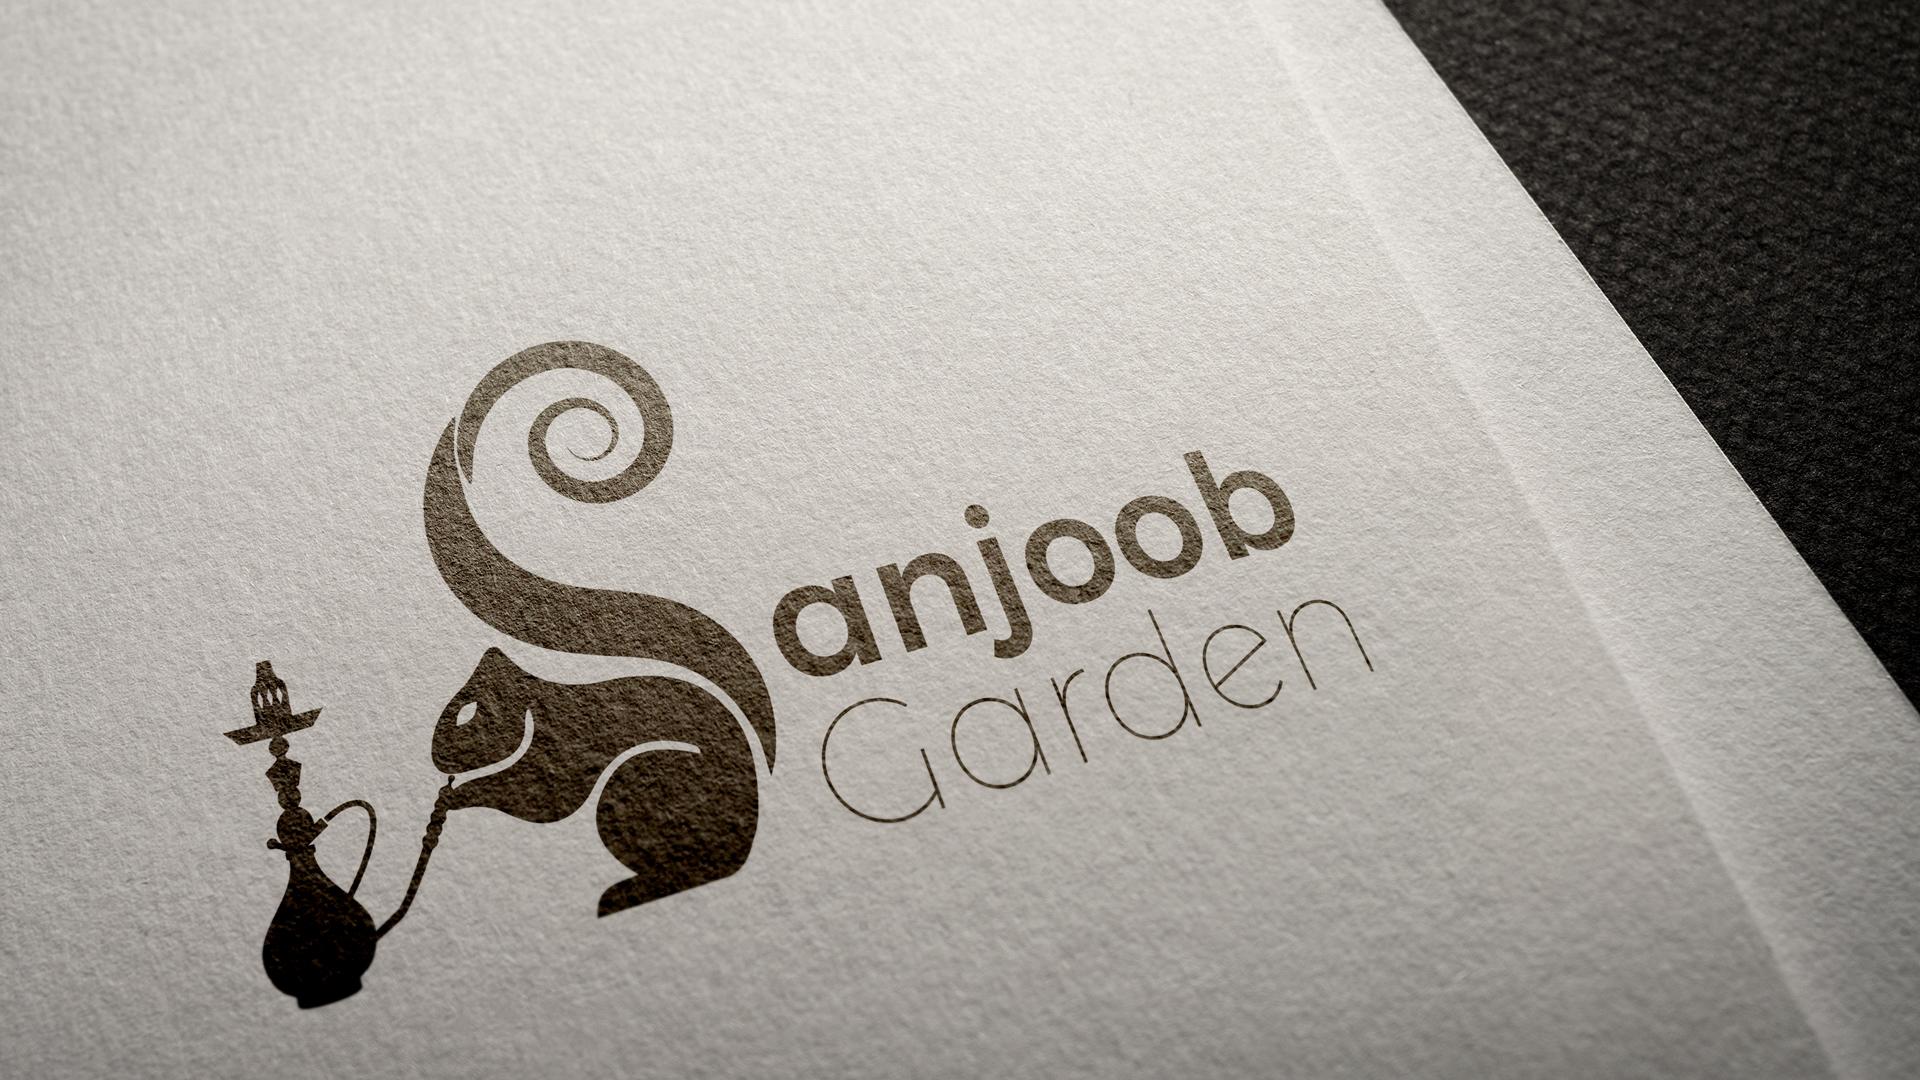 Sanjoob-Garden-Logo-Mockup